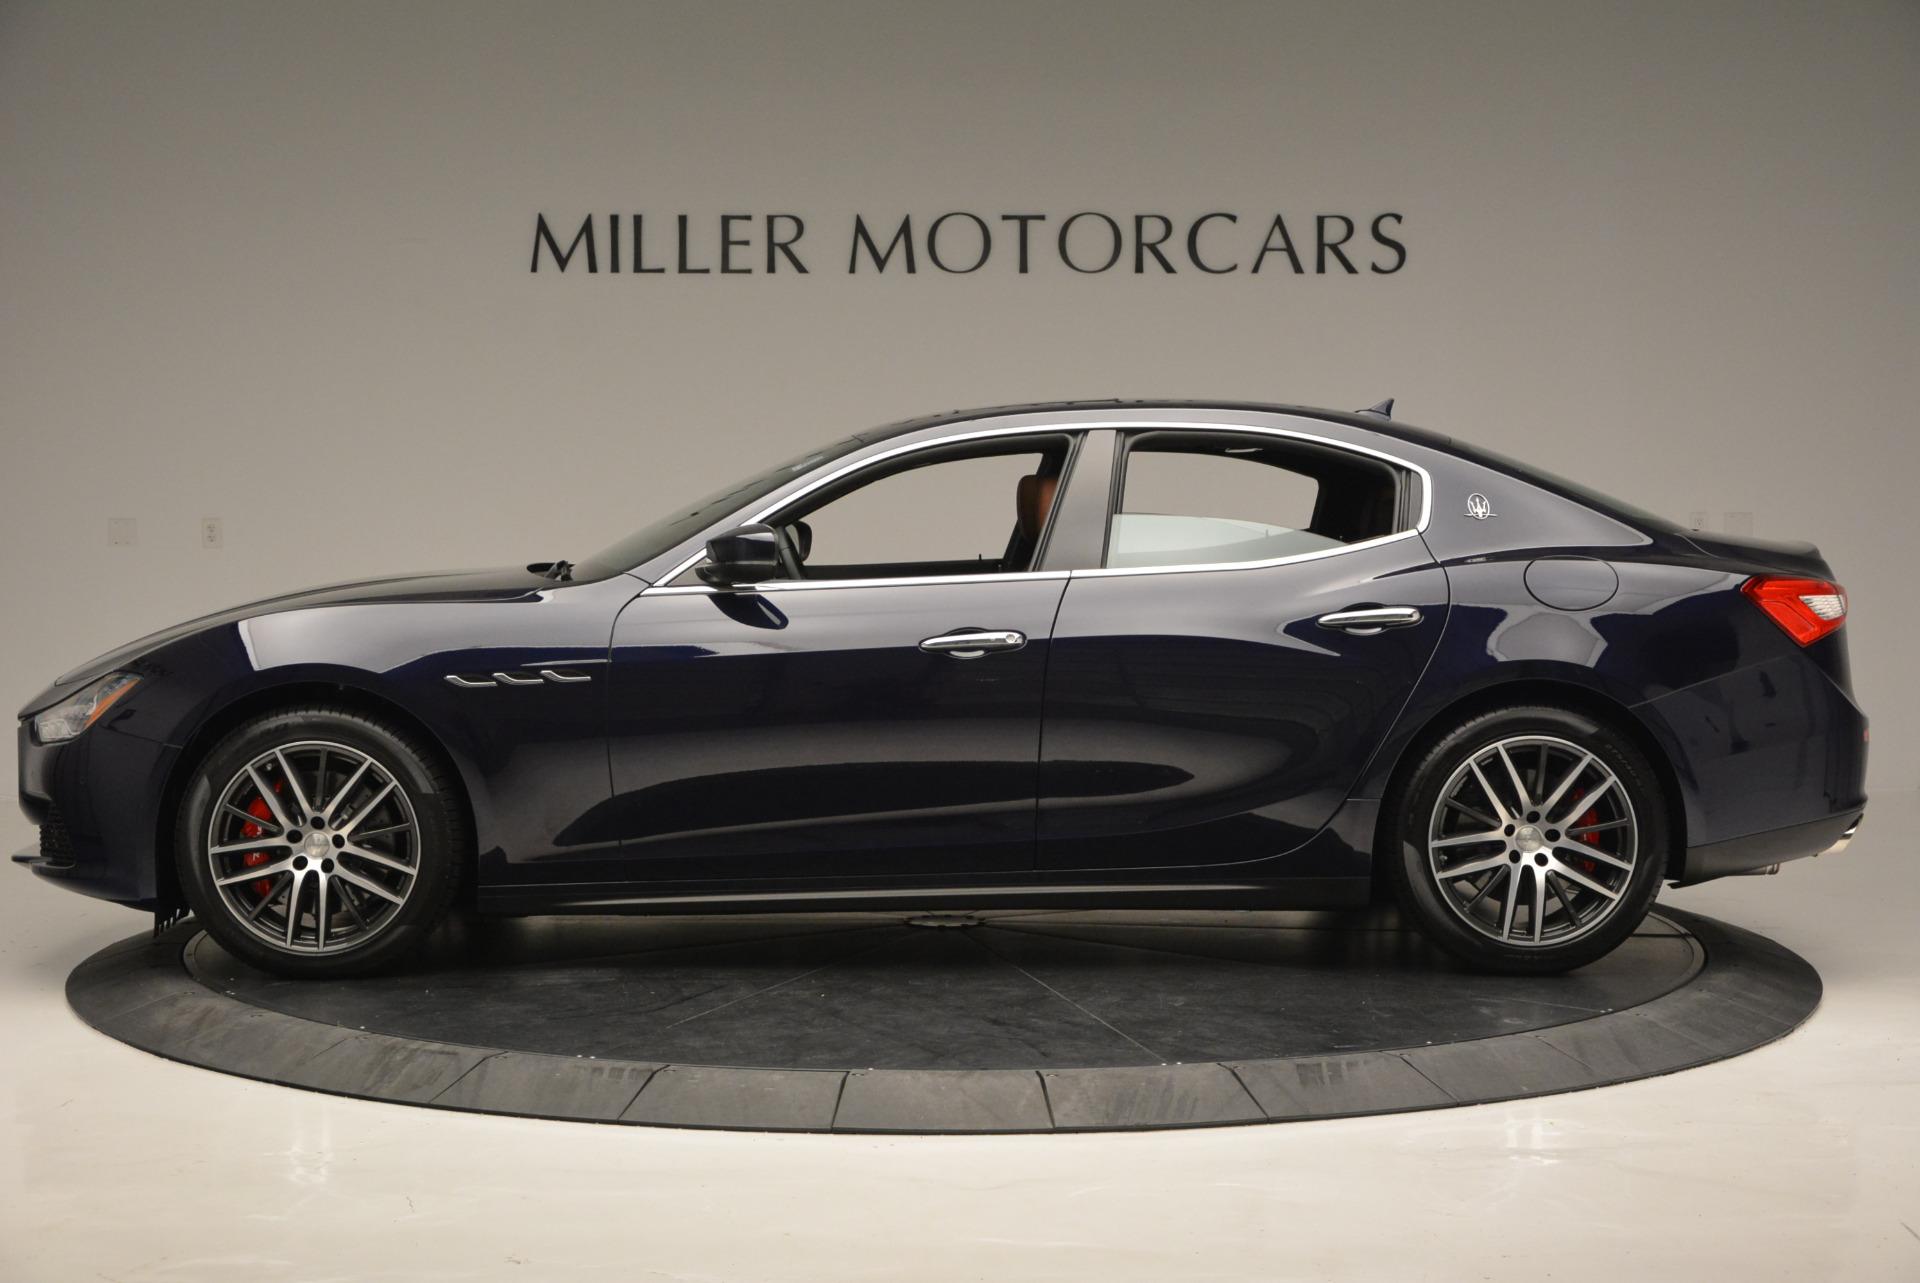 Used 2017 Maserati Ghibli S Q4 - EX Loaner For Sale In Greenwich, CT 568_p3